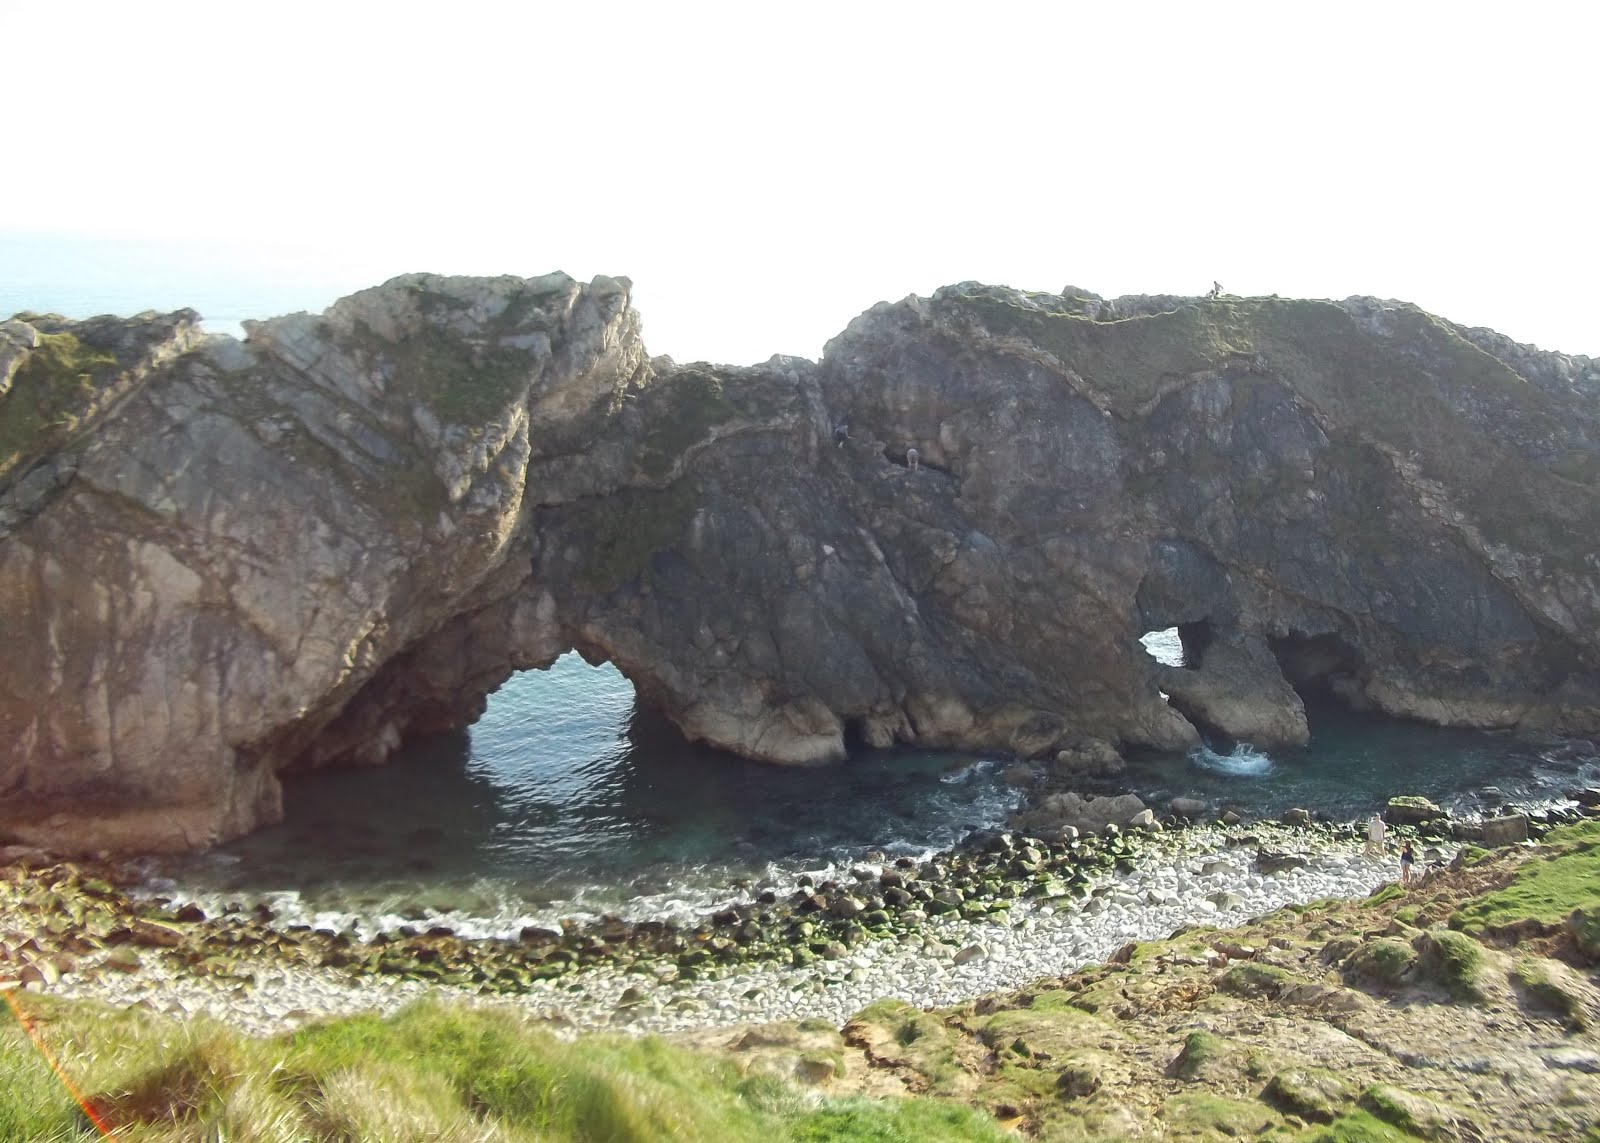 Jurassic Coastline, Dorset